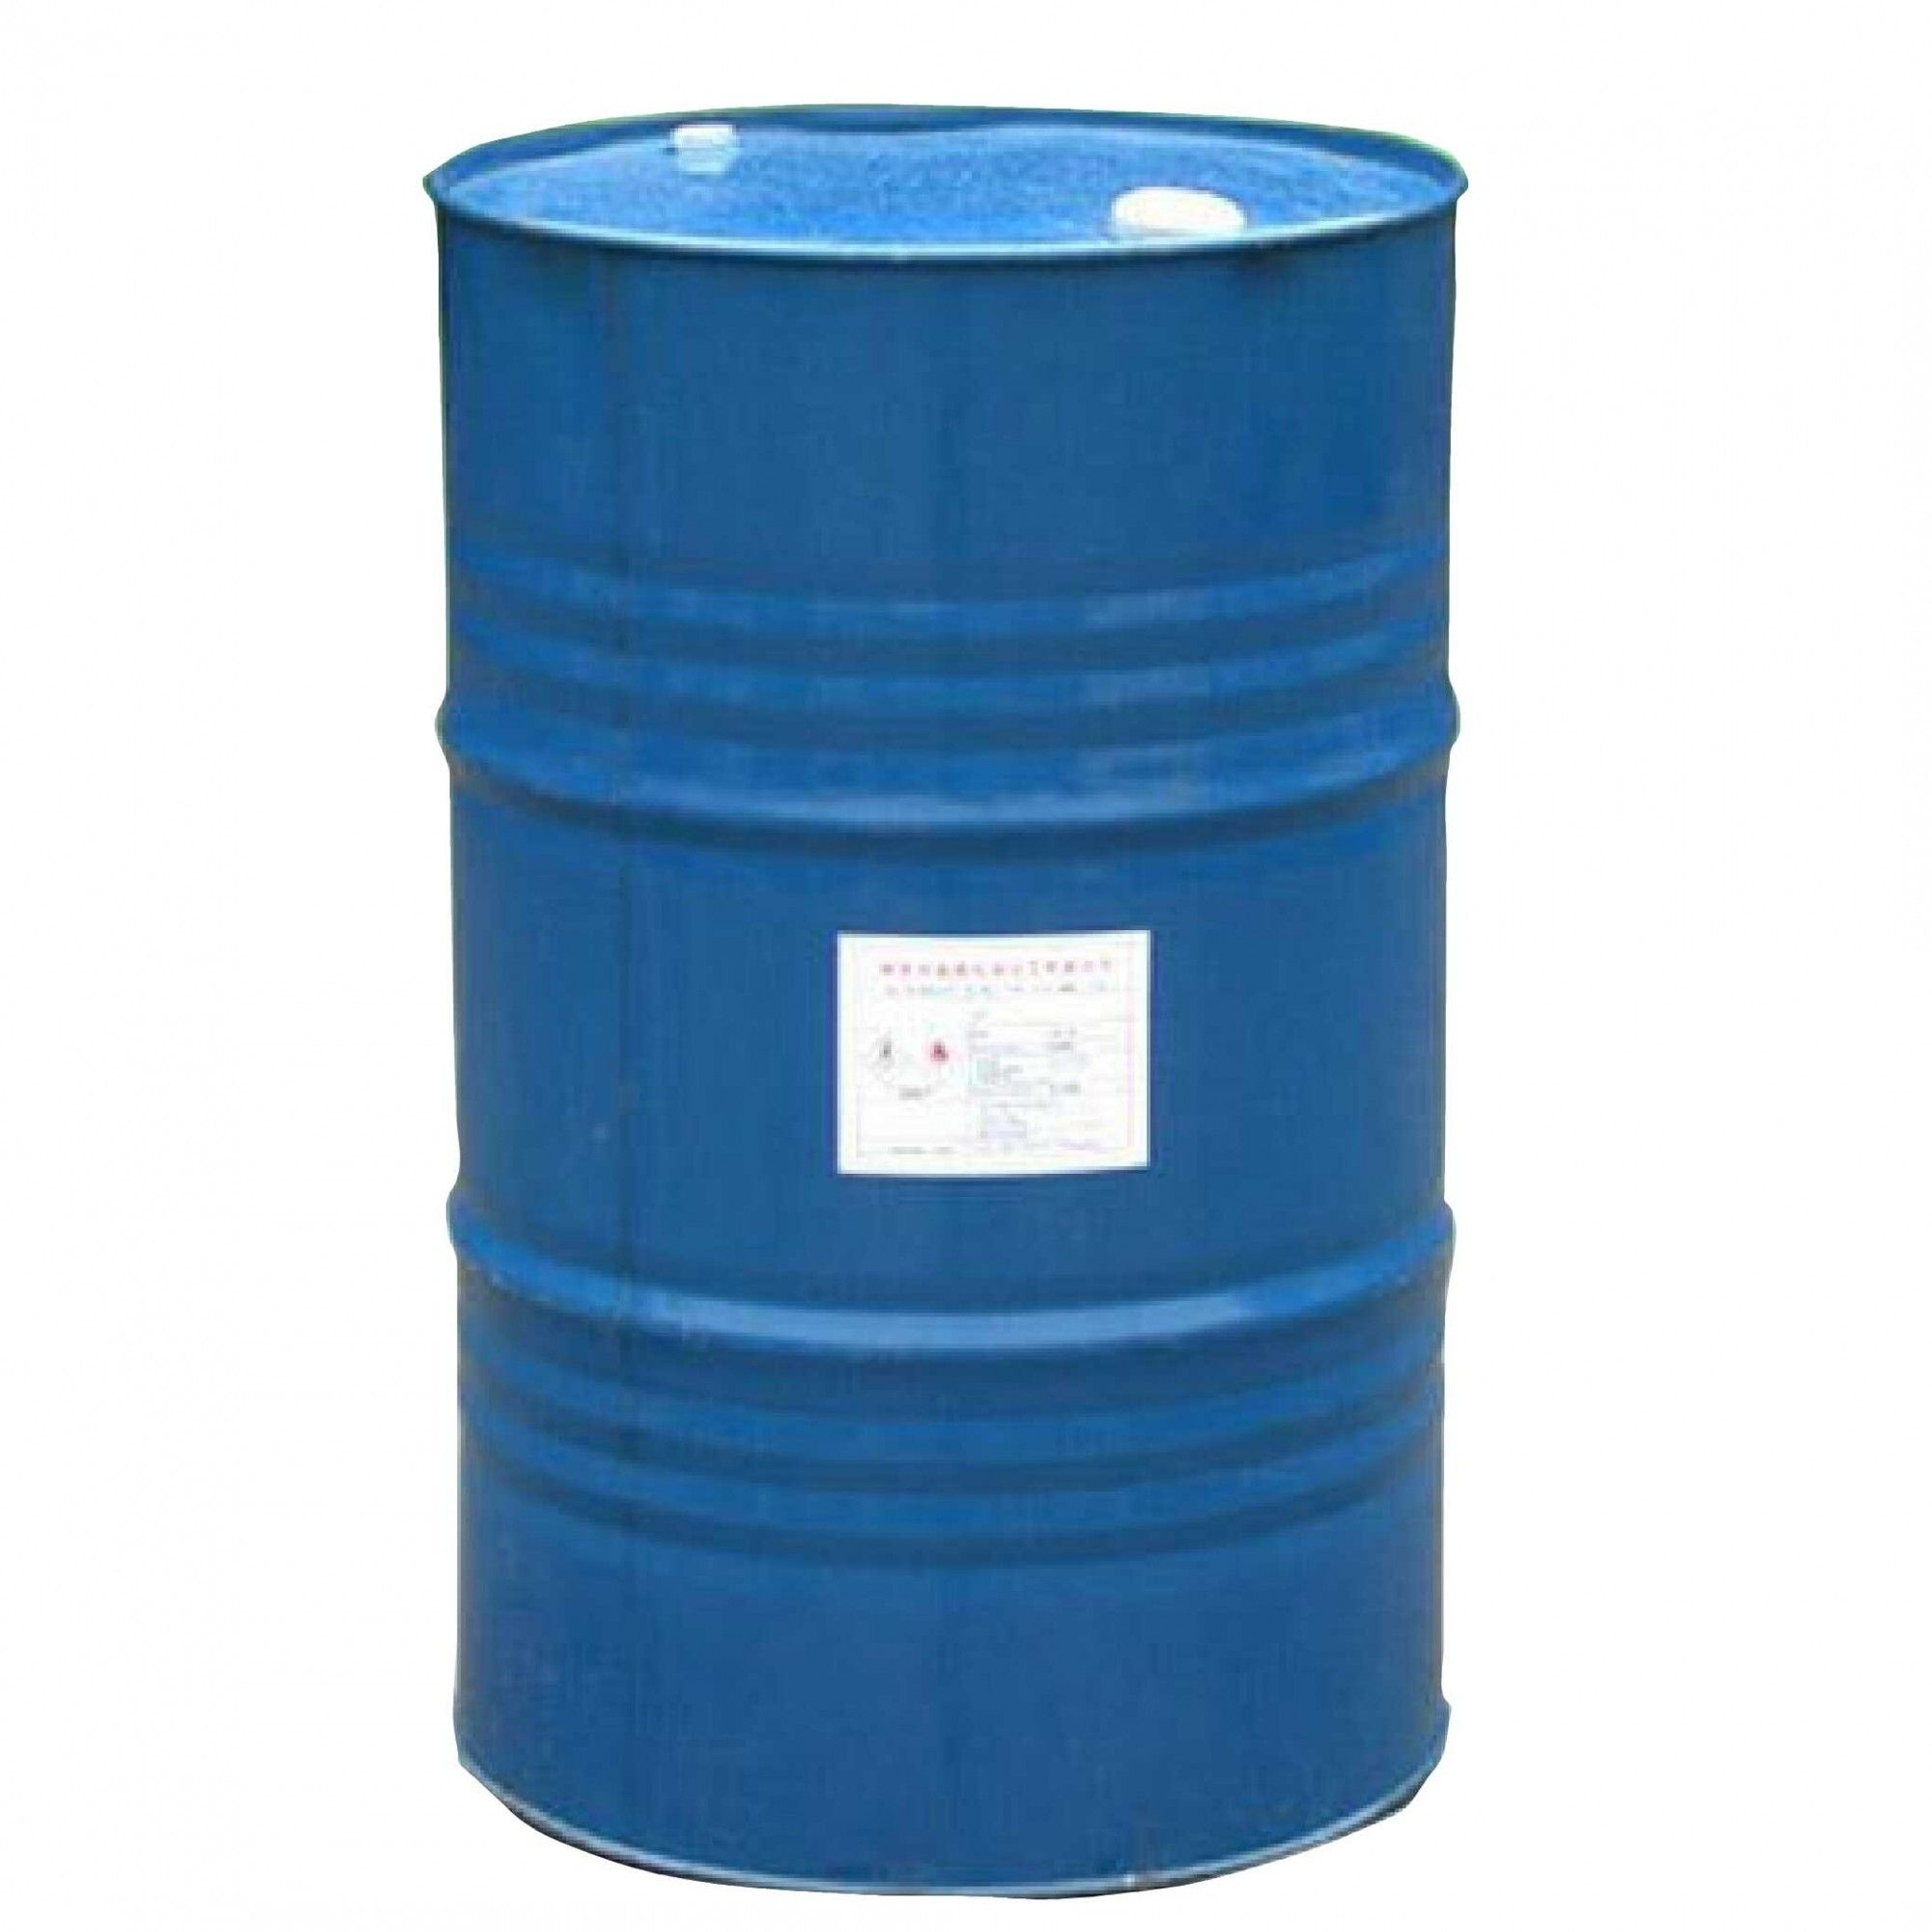 Propyleenglykol Agrivet 200ltr